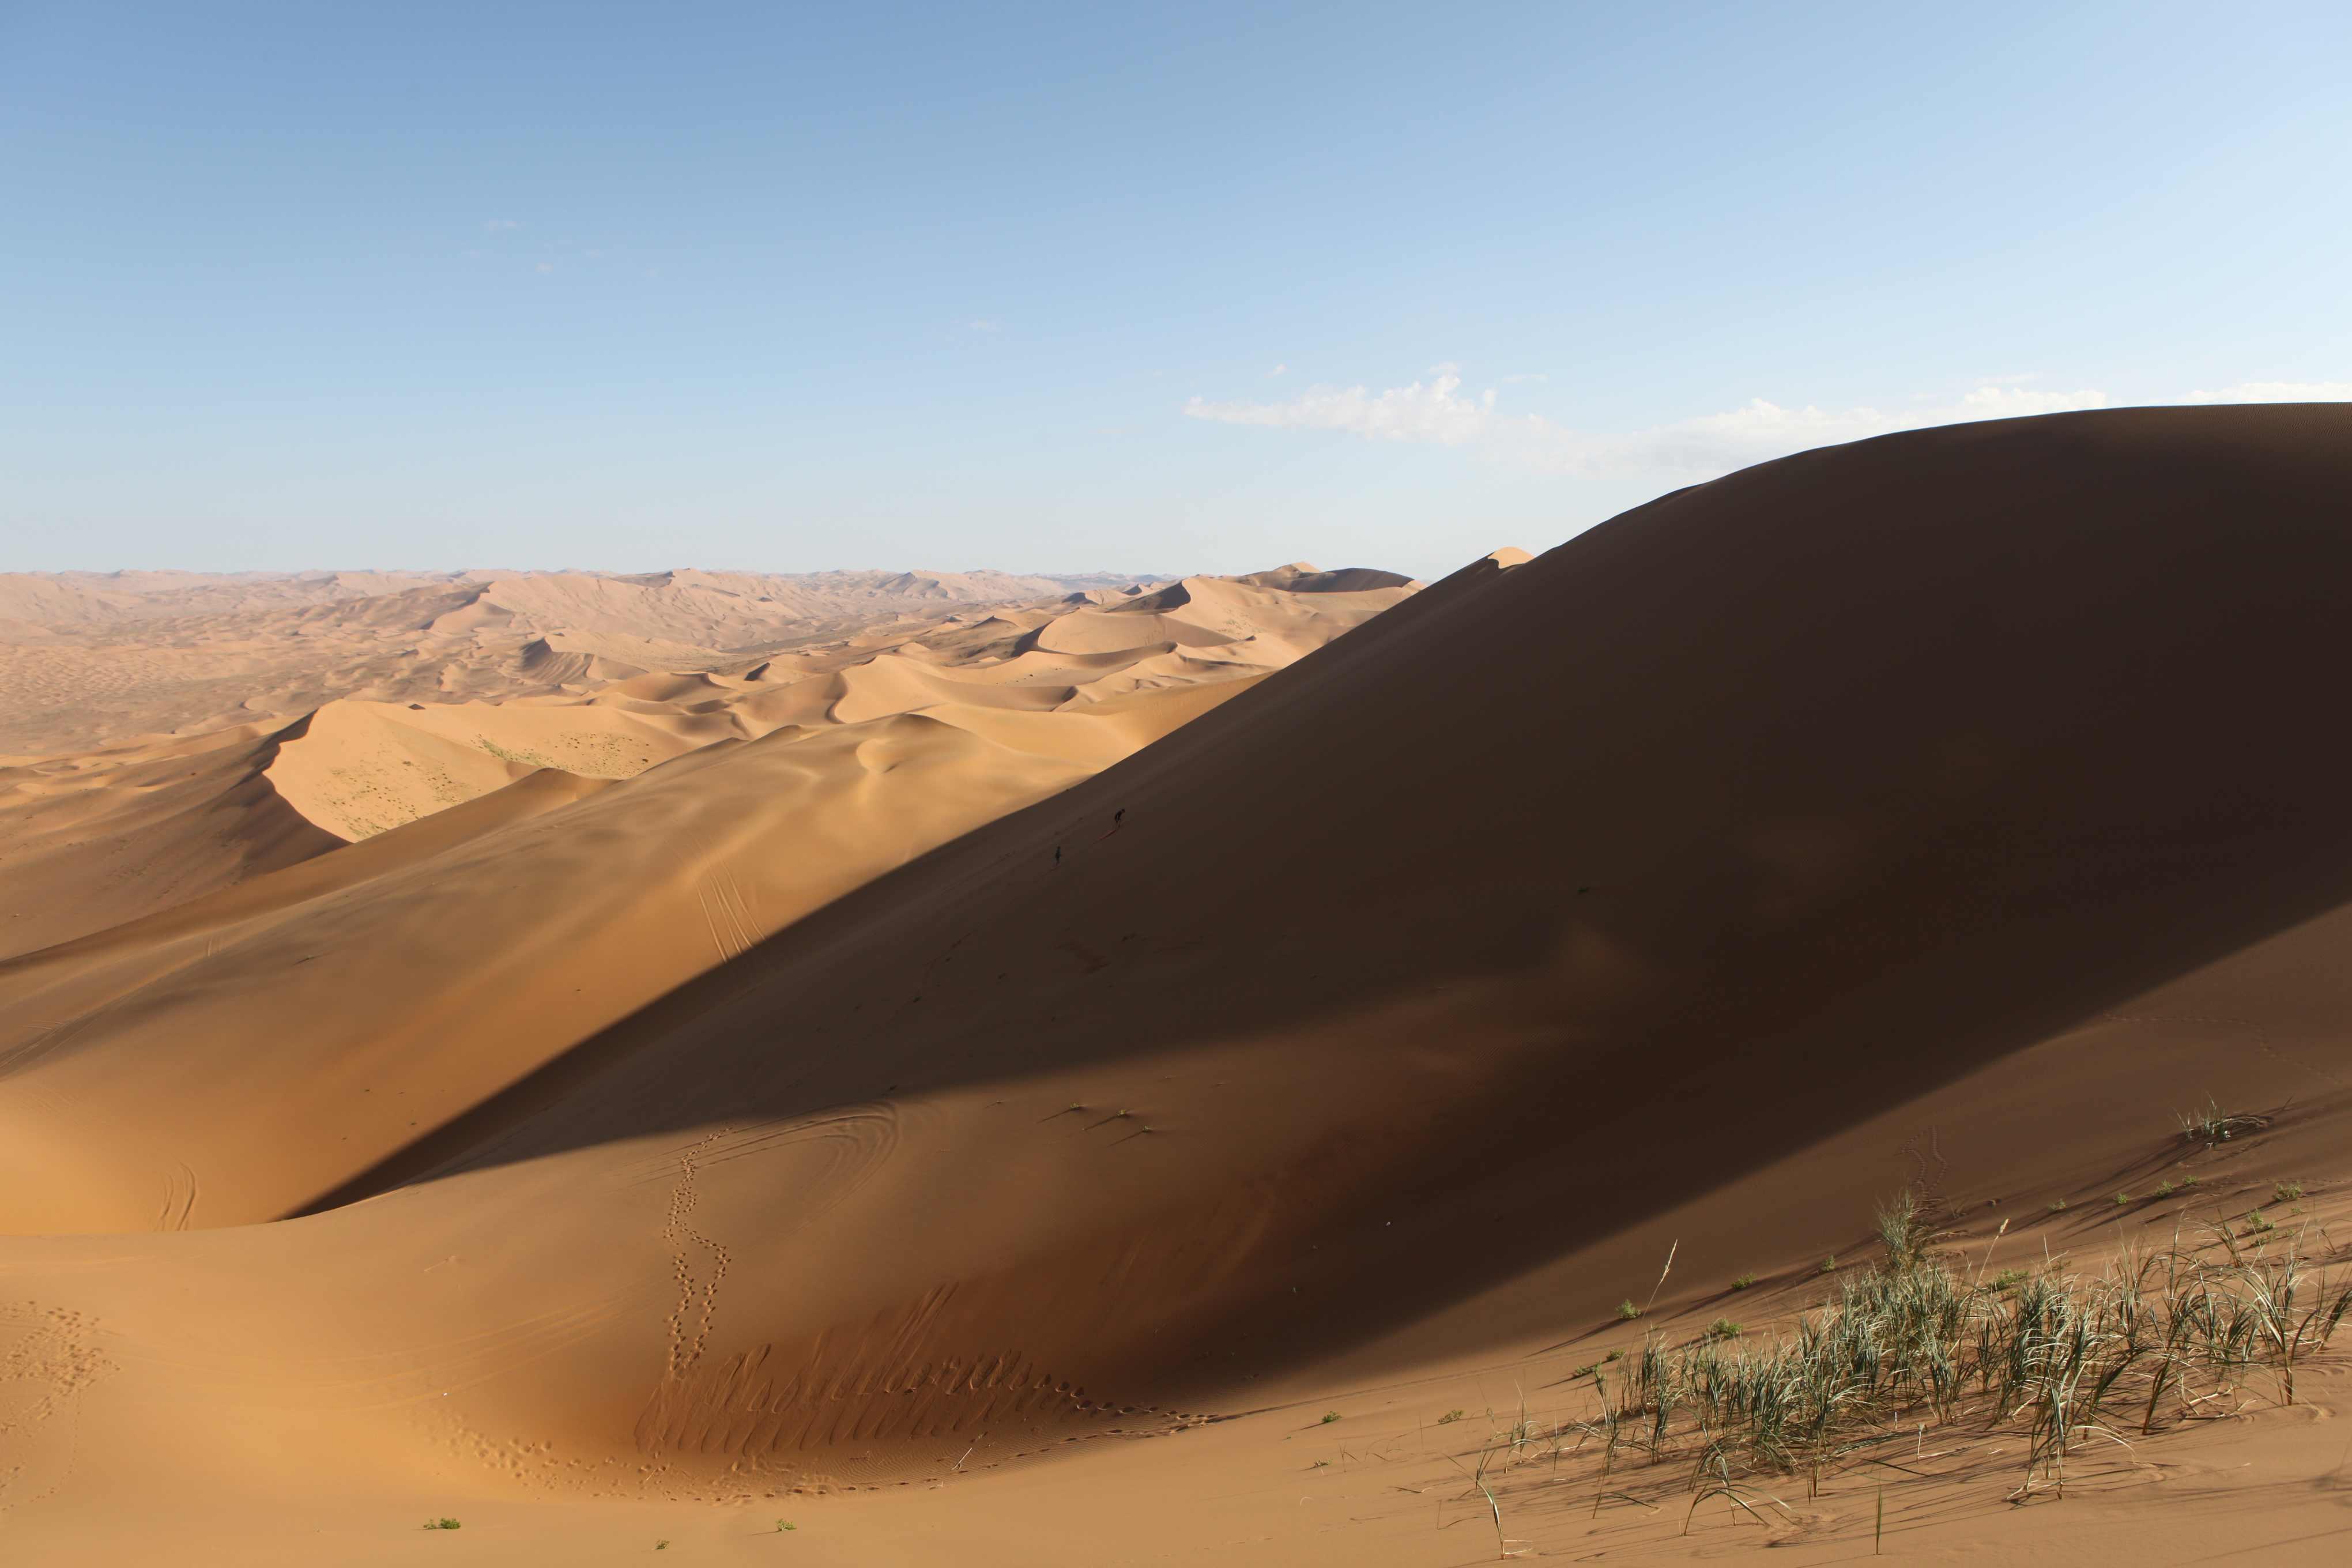 Badain Jaran Desert - Wikipedia